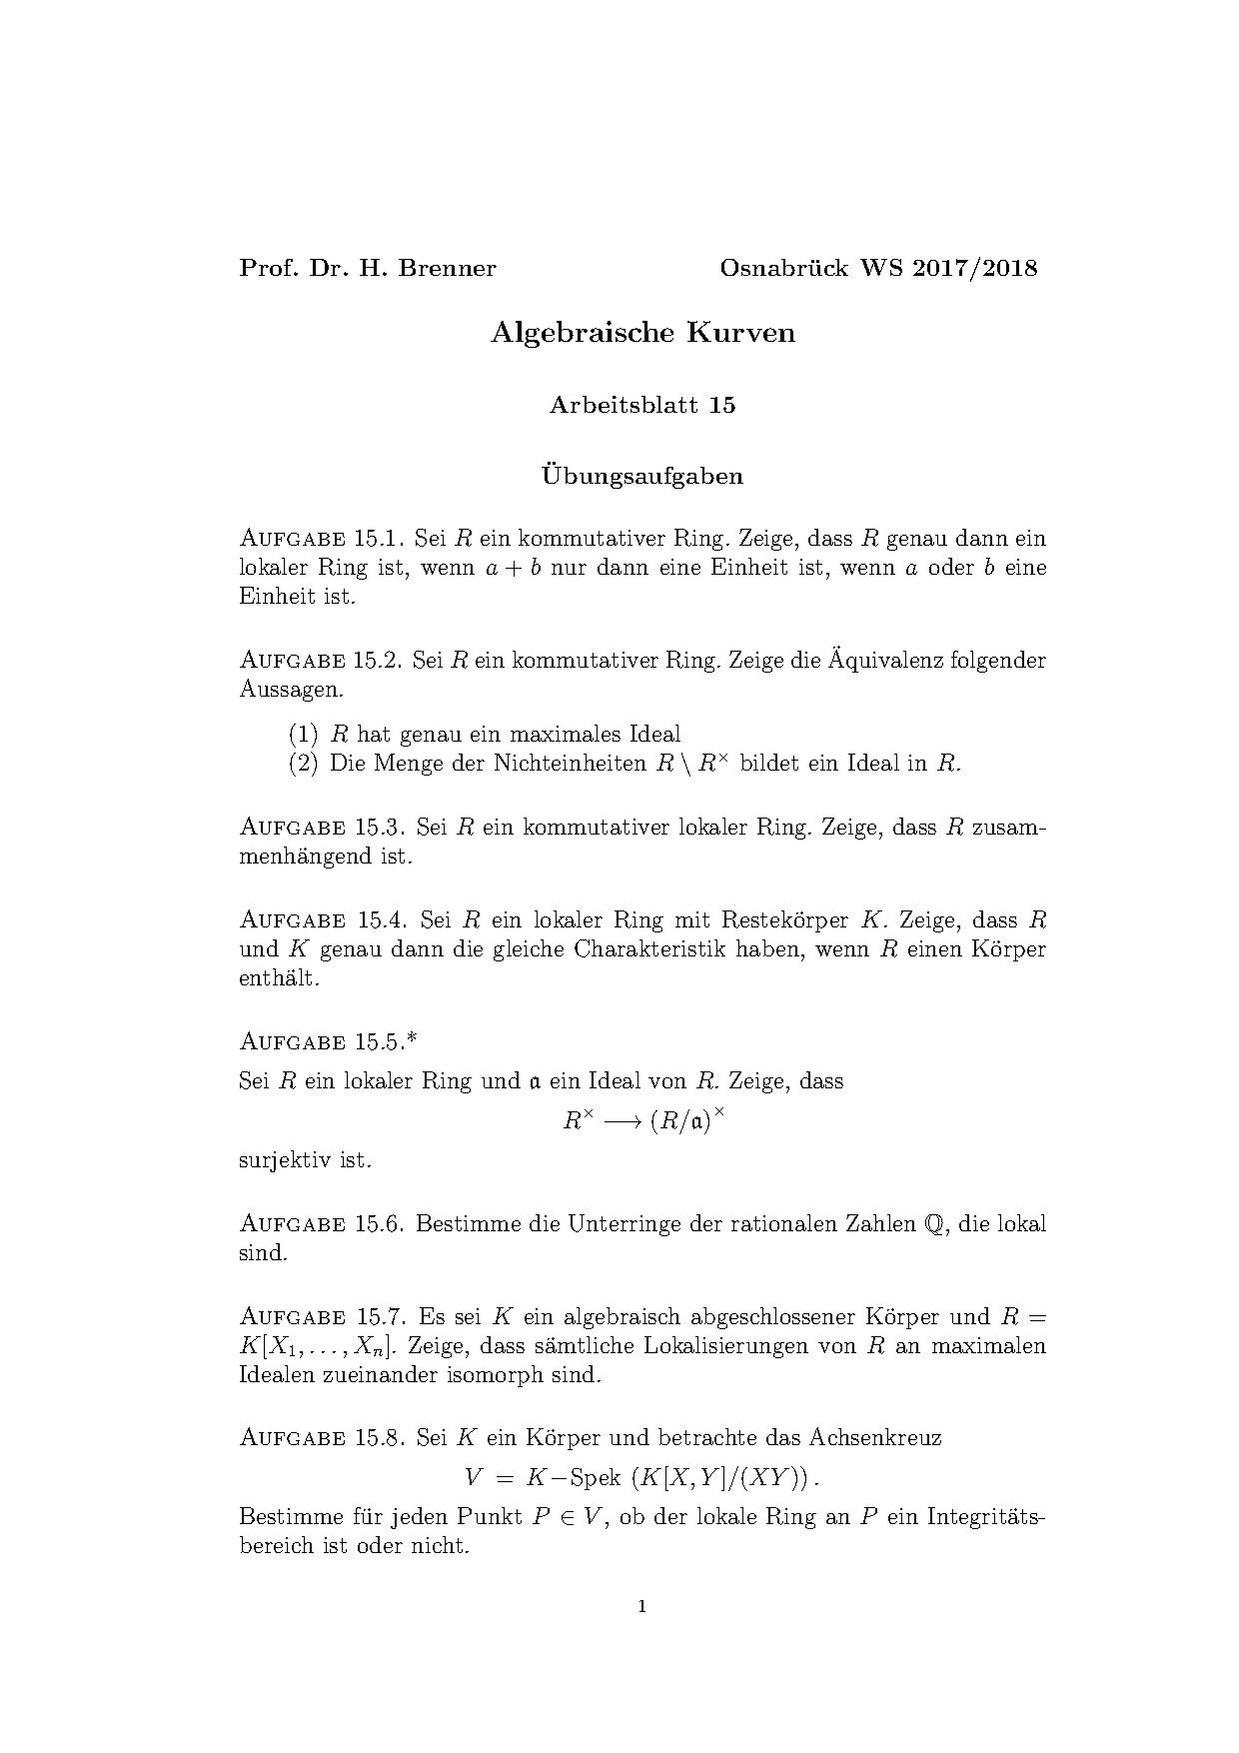 File:Algebraische Kurven (Osnabrück 2017-2018)Arbeitsblatt15.pdf ...